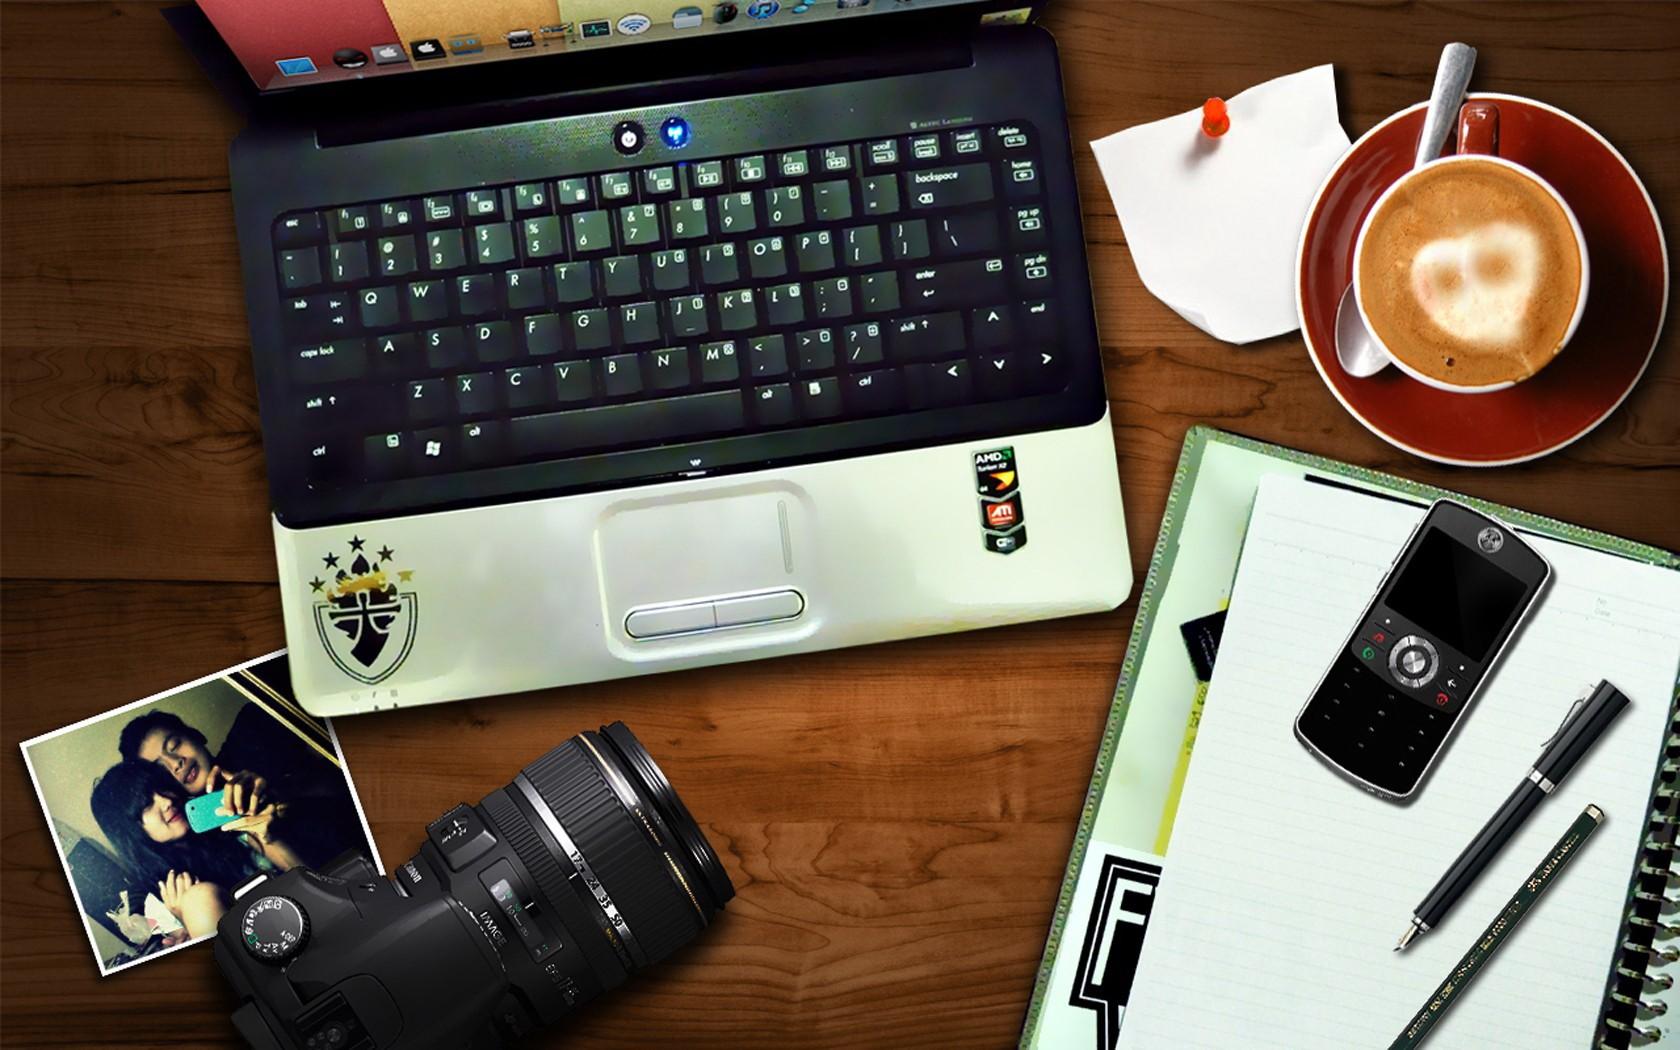 General 1680x1050 laptop phone cellphone camera coffee technology